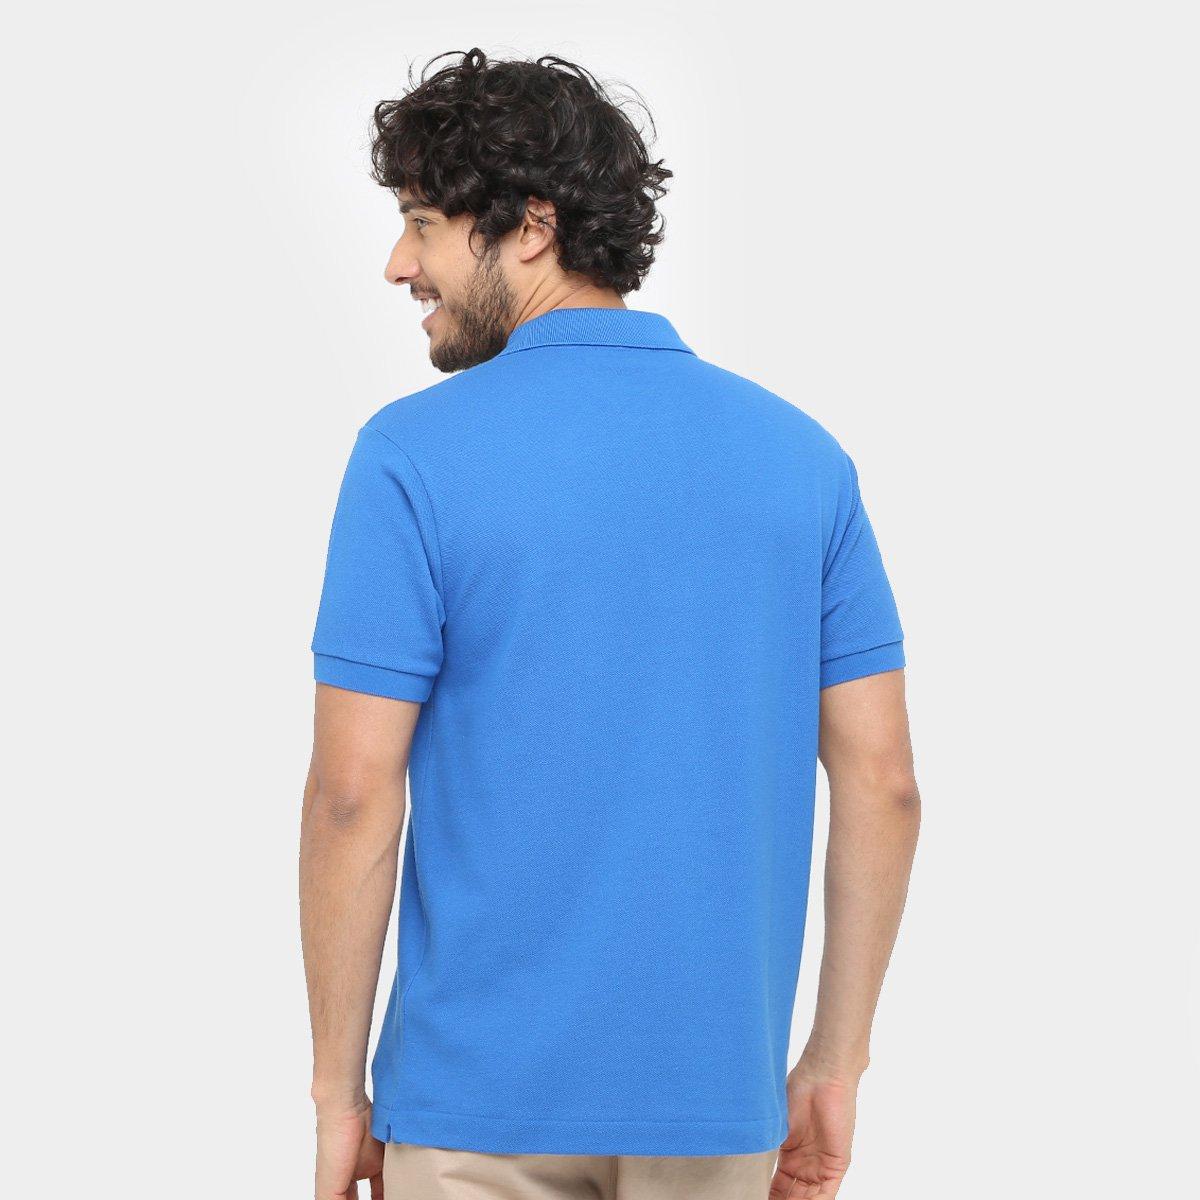 d8a1fc73f7 Camisa Polo Lacoste Piquet Original Fit Masculina - Azul Royal ...